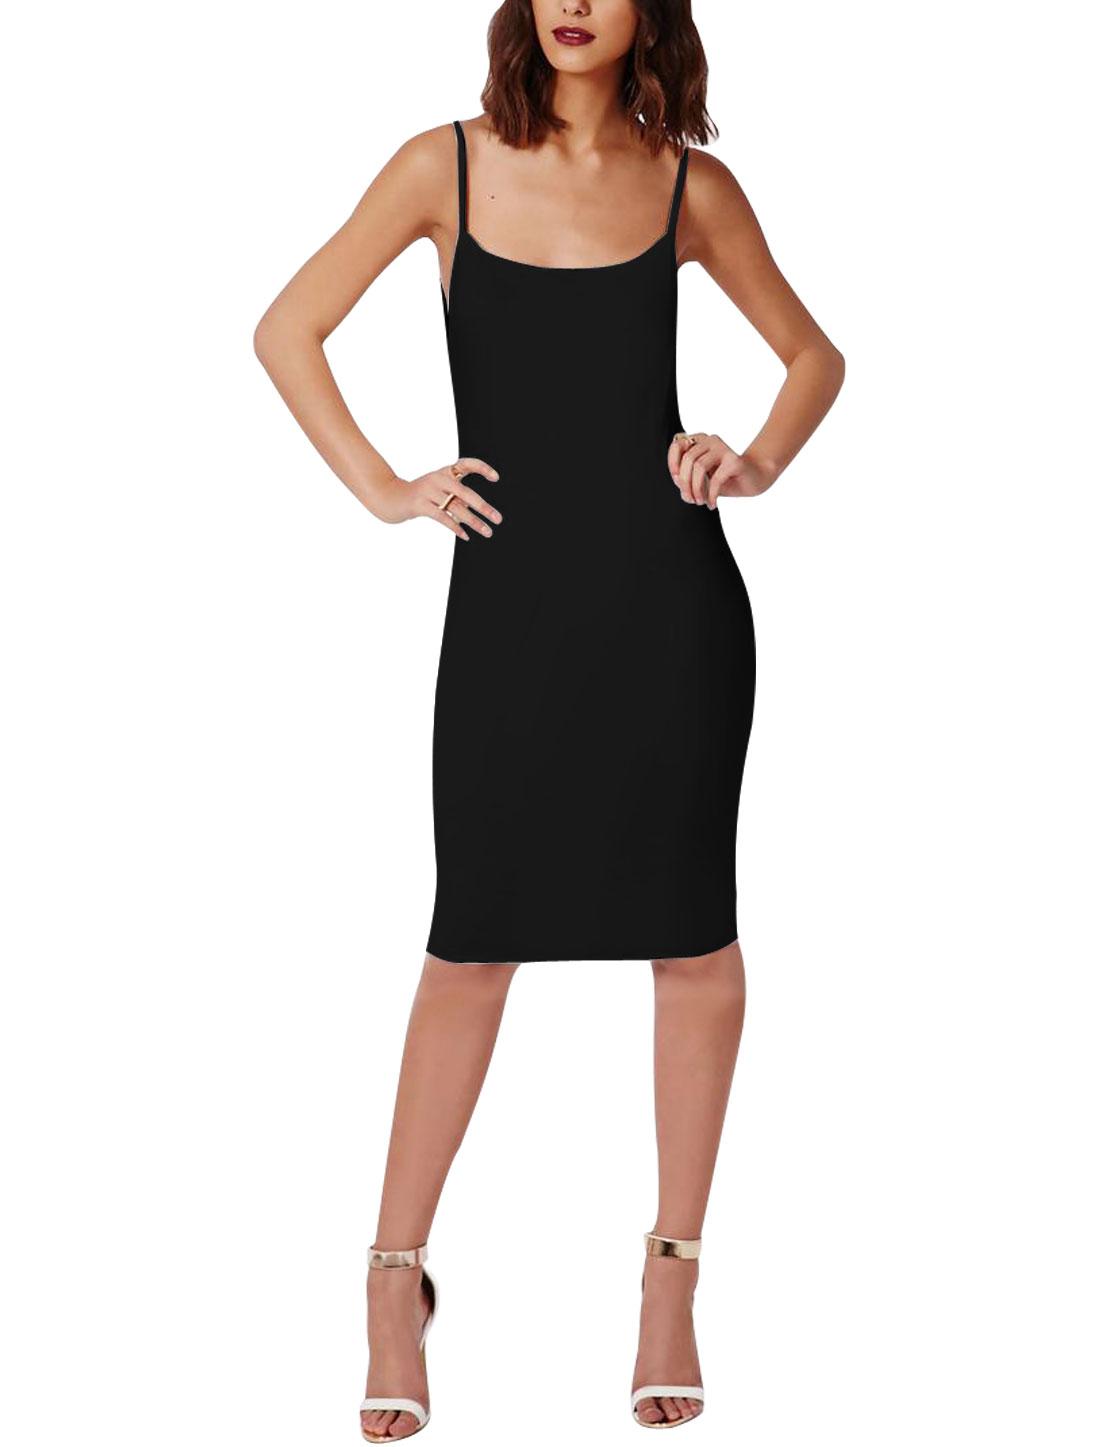 Ladies Scoop Neck Sleeveless Full Lined Tight Dresses Black XS